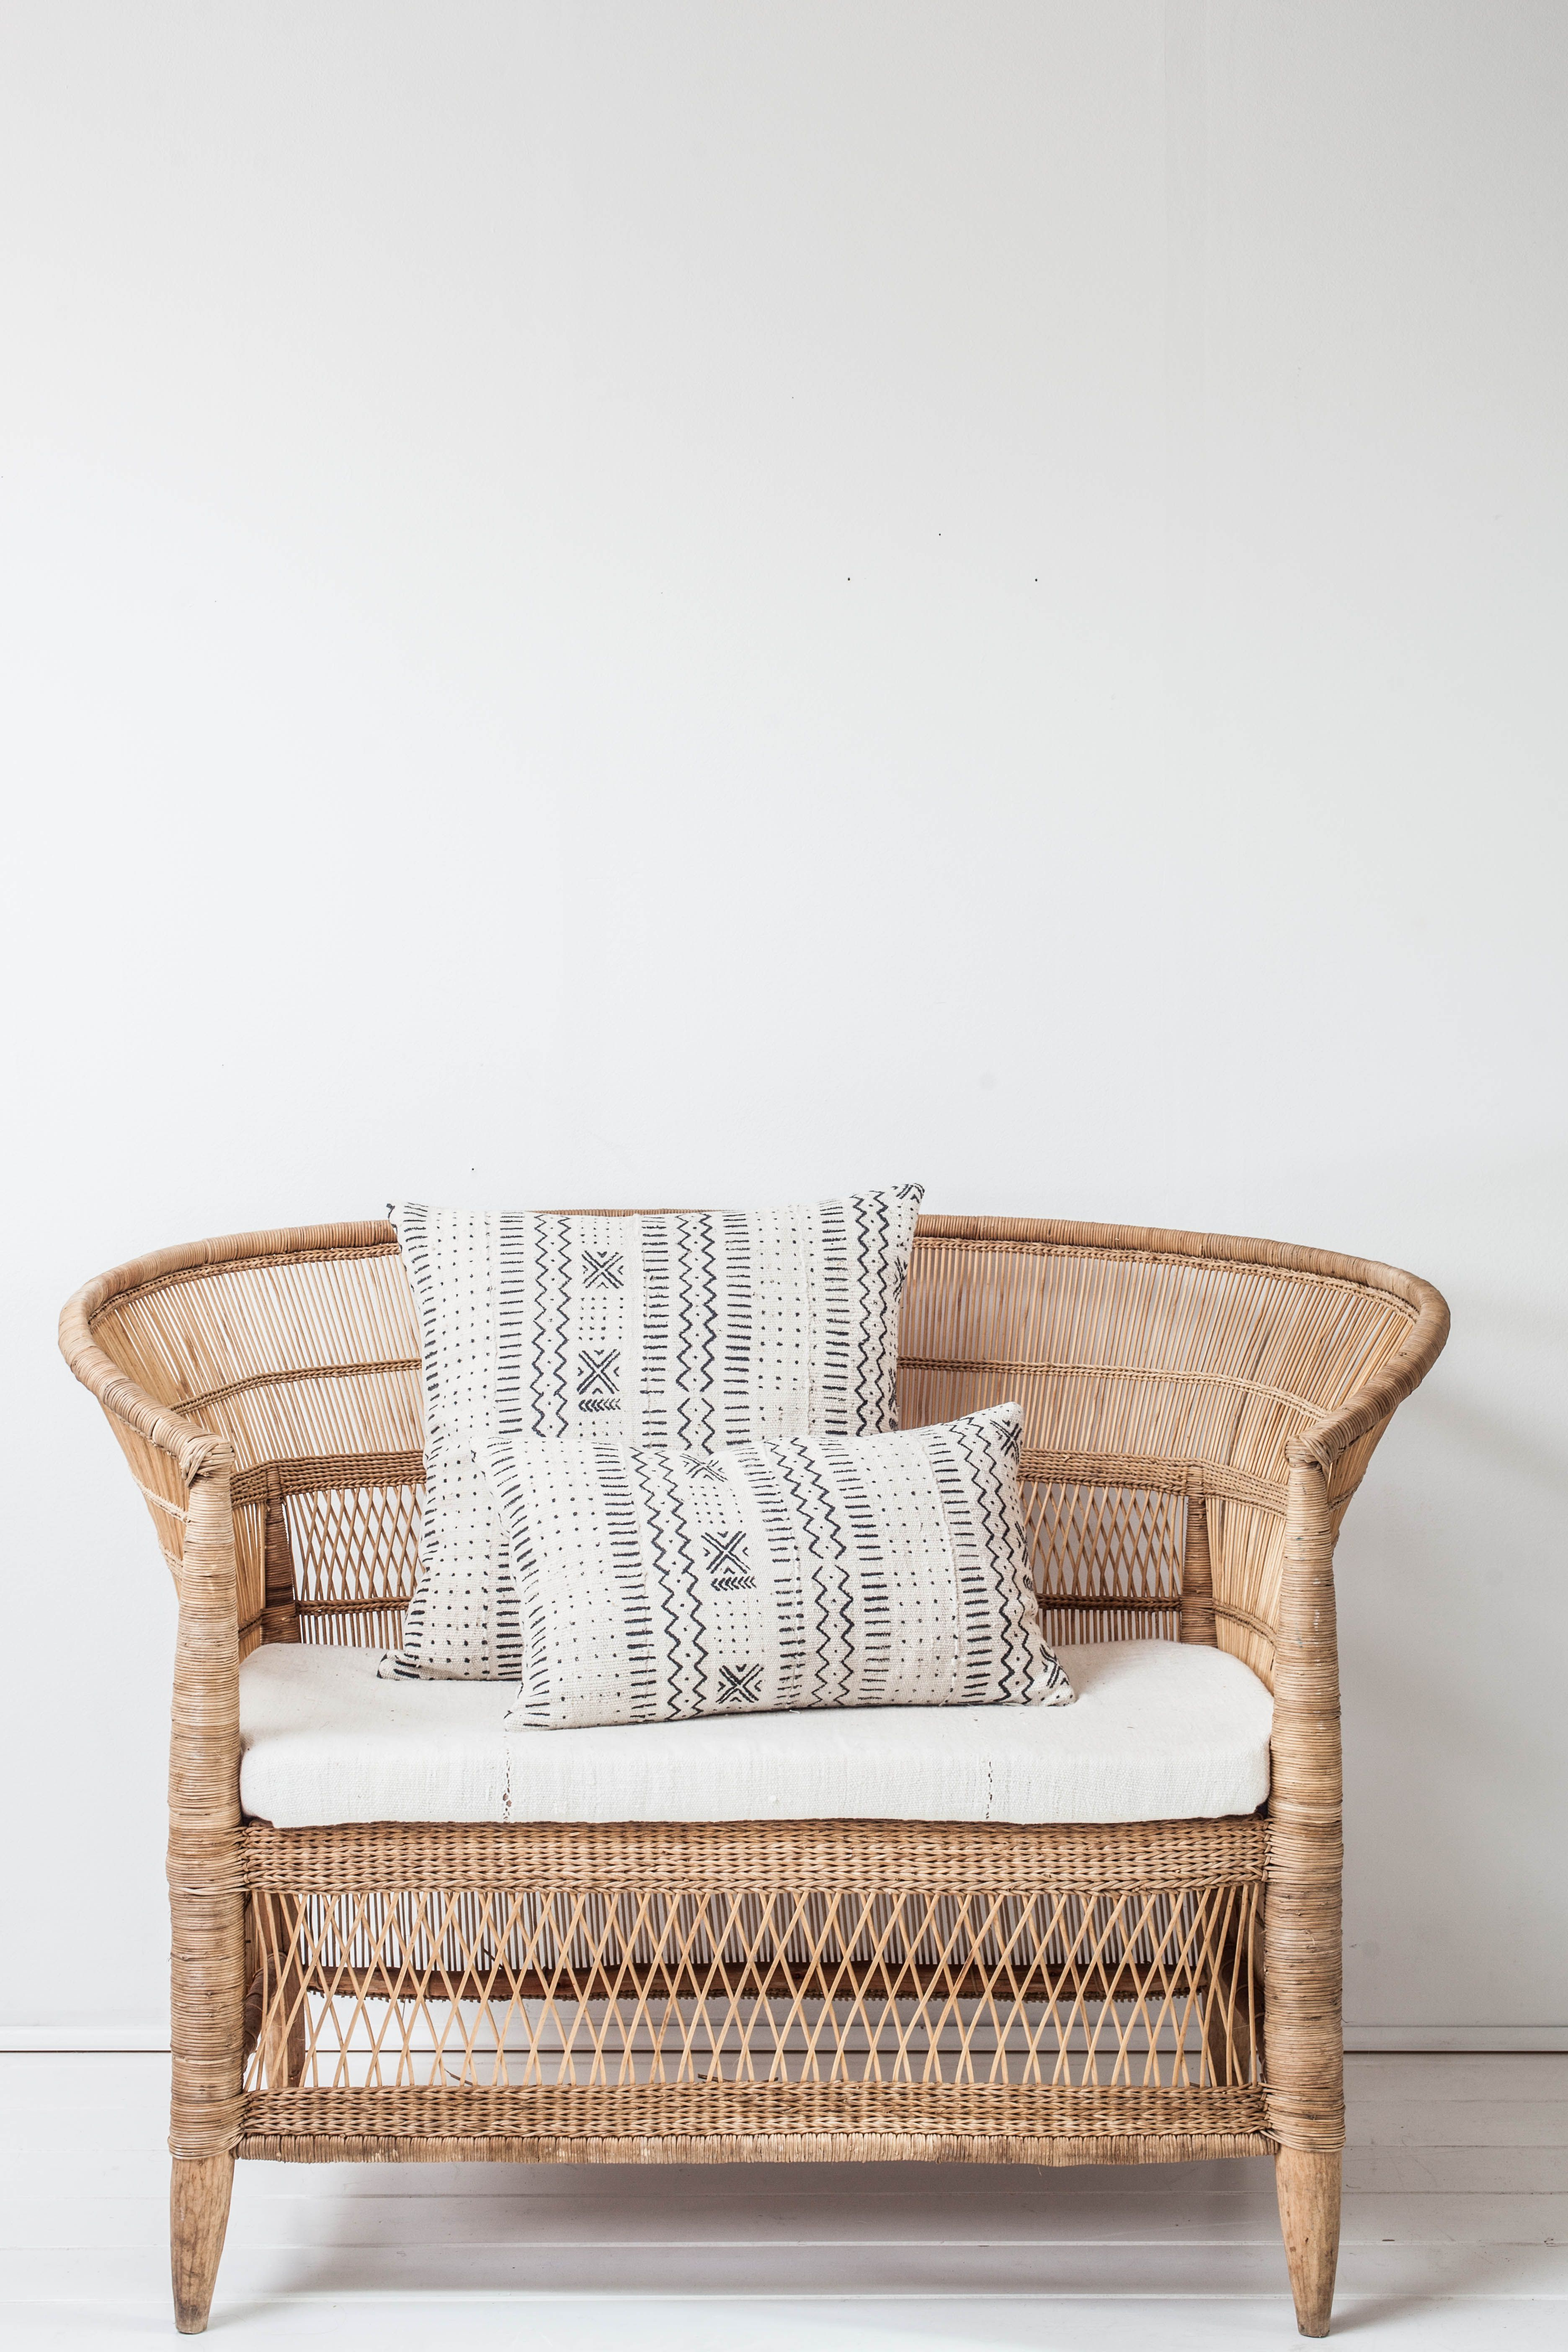 Sofa Mimbre H9d9 Woven Rattan Chair F U R N I T U R E Muebles De Mimbre